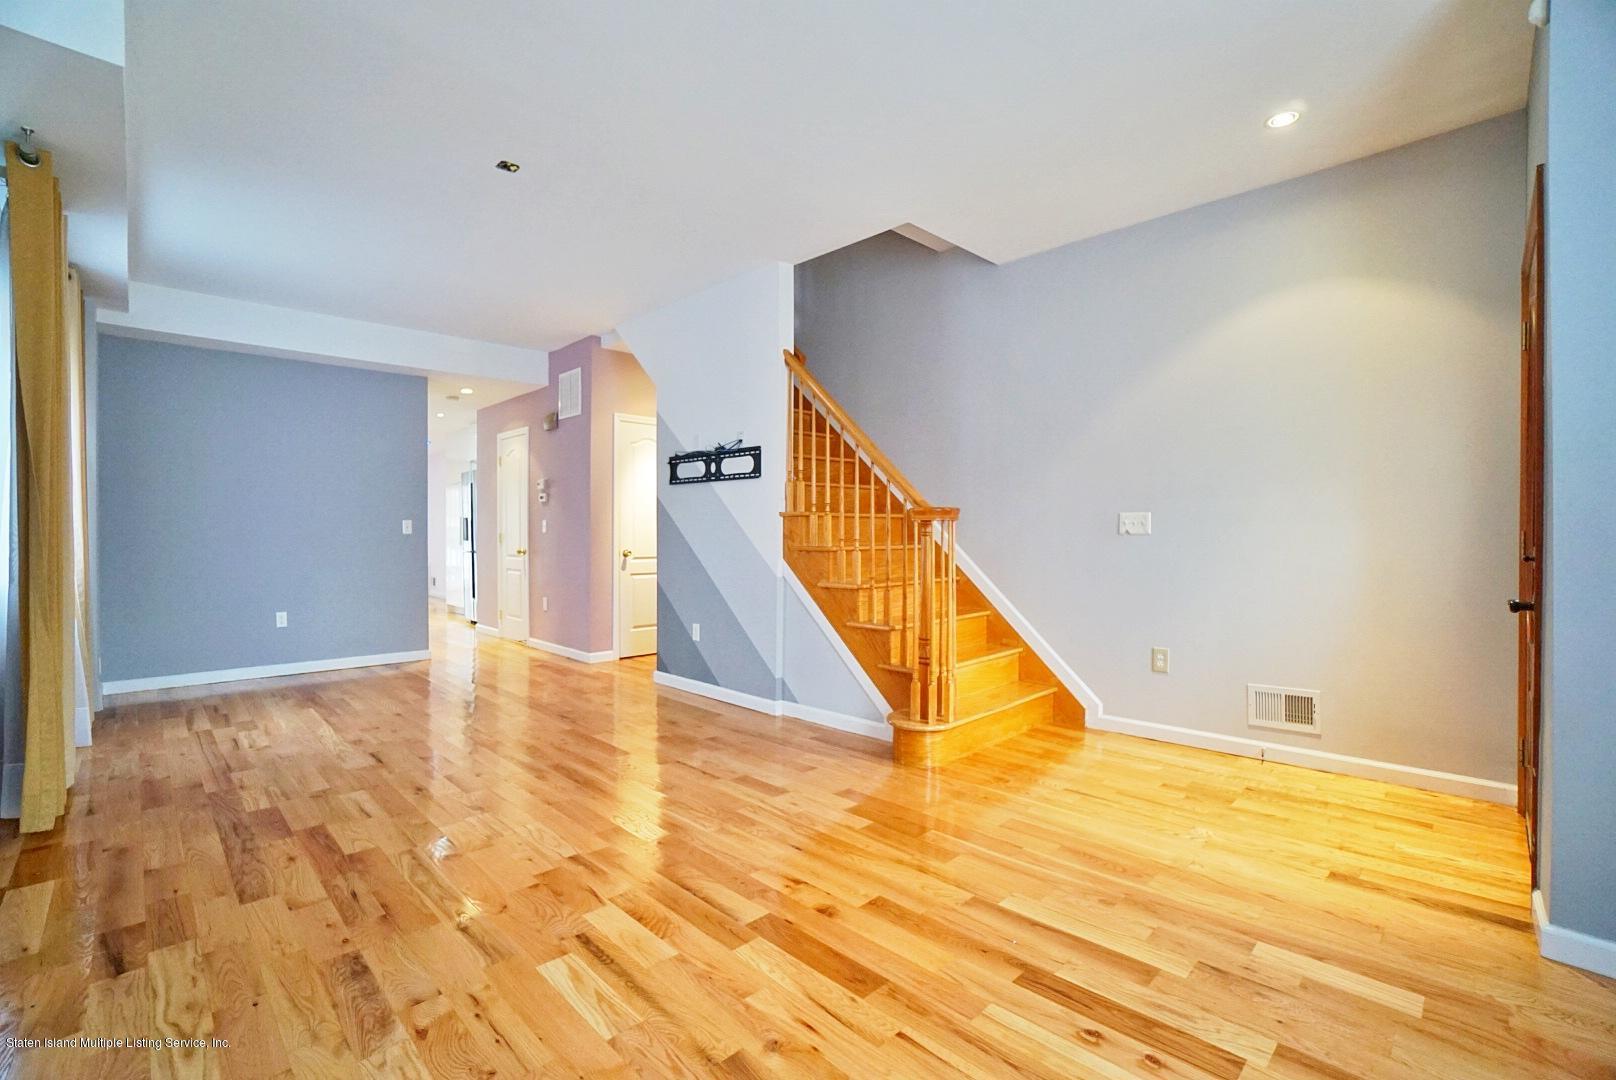 Single Family - Detached 311 Norway Avenue  Staten Island, NY 10305, MLS-1132870-3